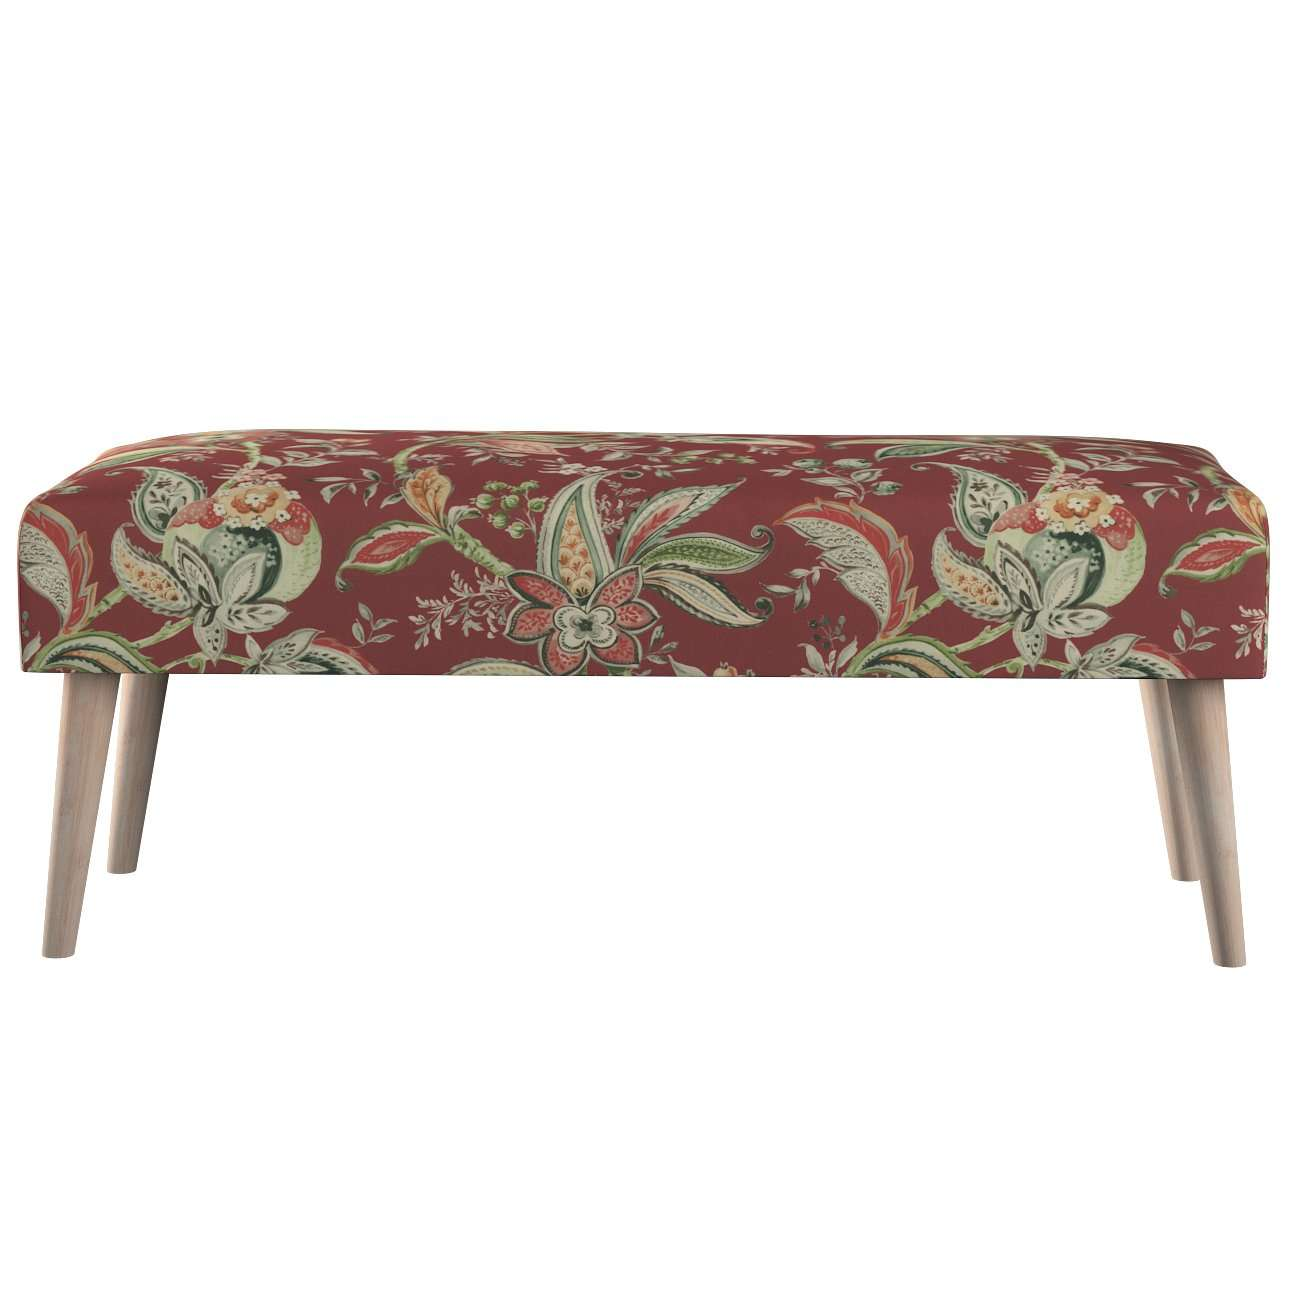 Ławka natural w kolekcji Gardenia, tkanina: 142-12